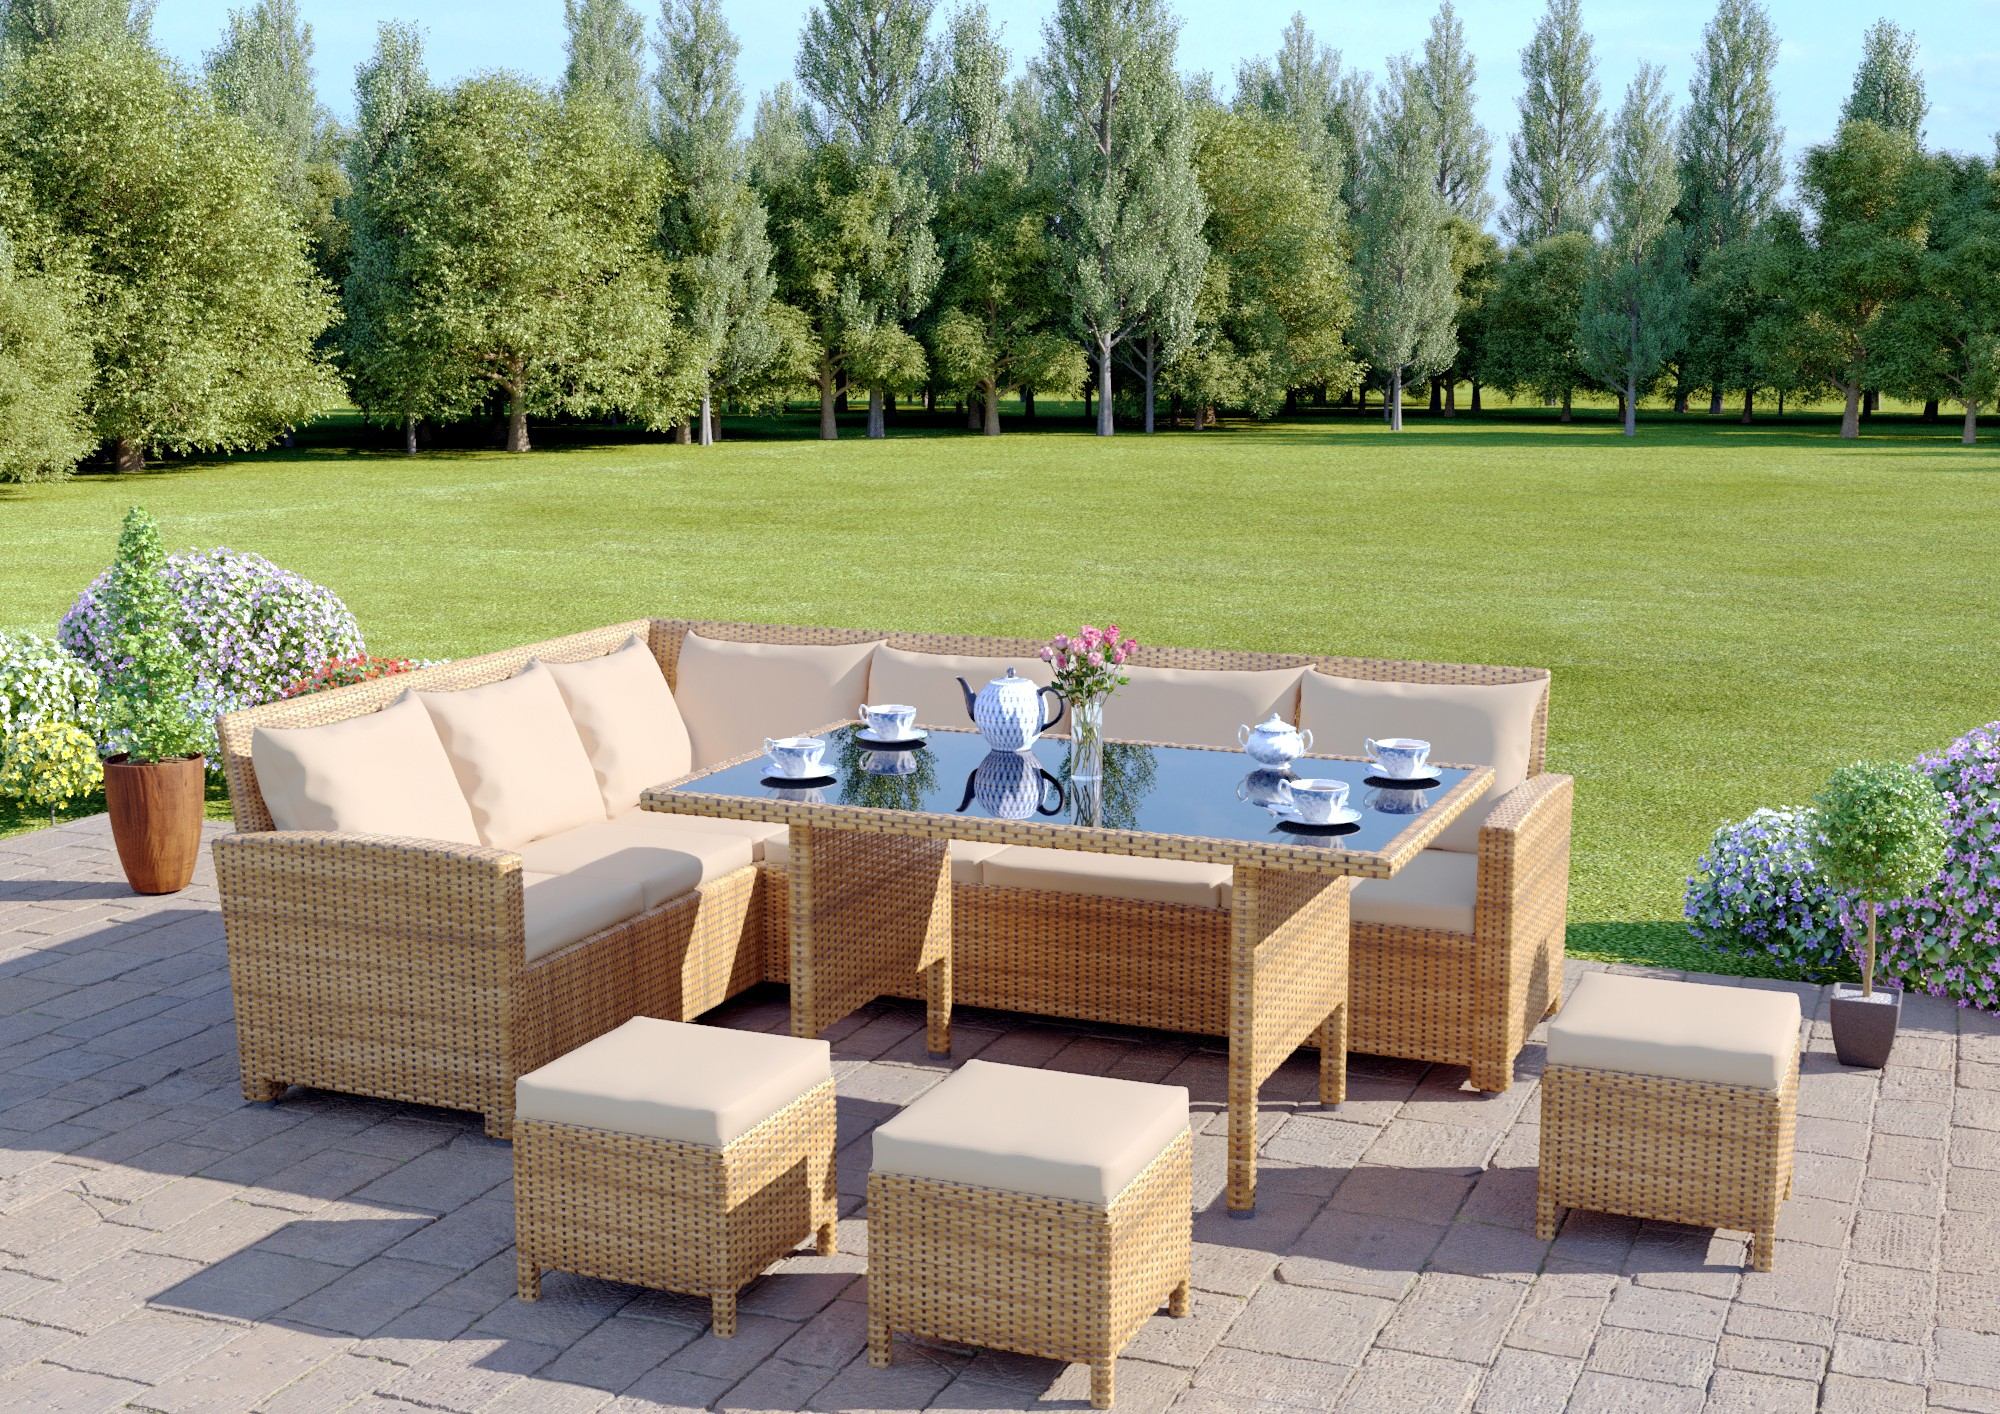 Rattan garden furniture 9 seater rattan corner garden sofa & dining table set in light PMKSDBP